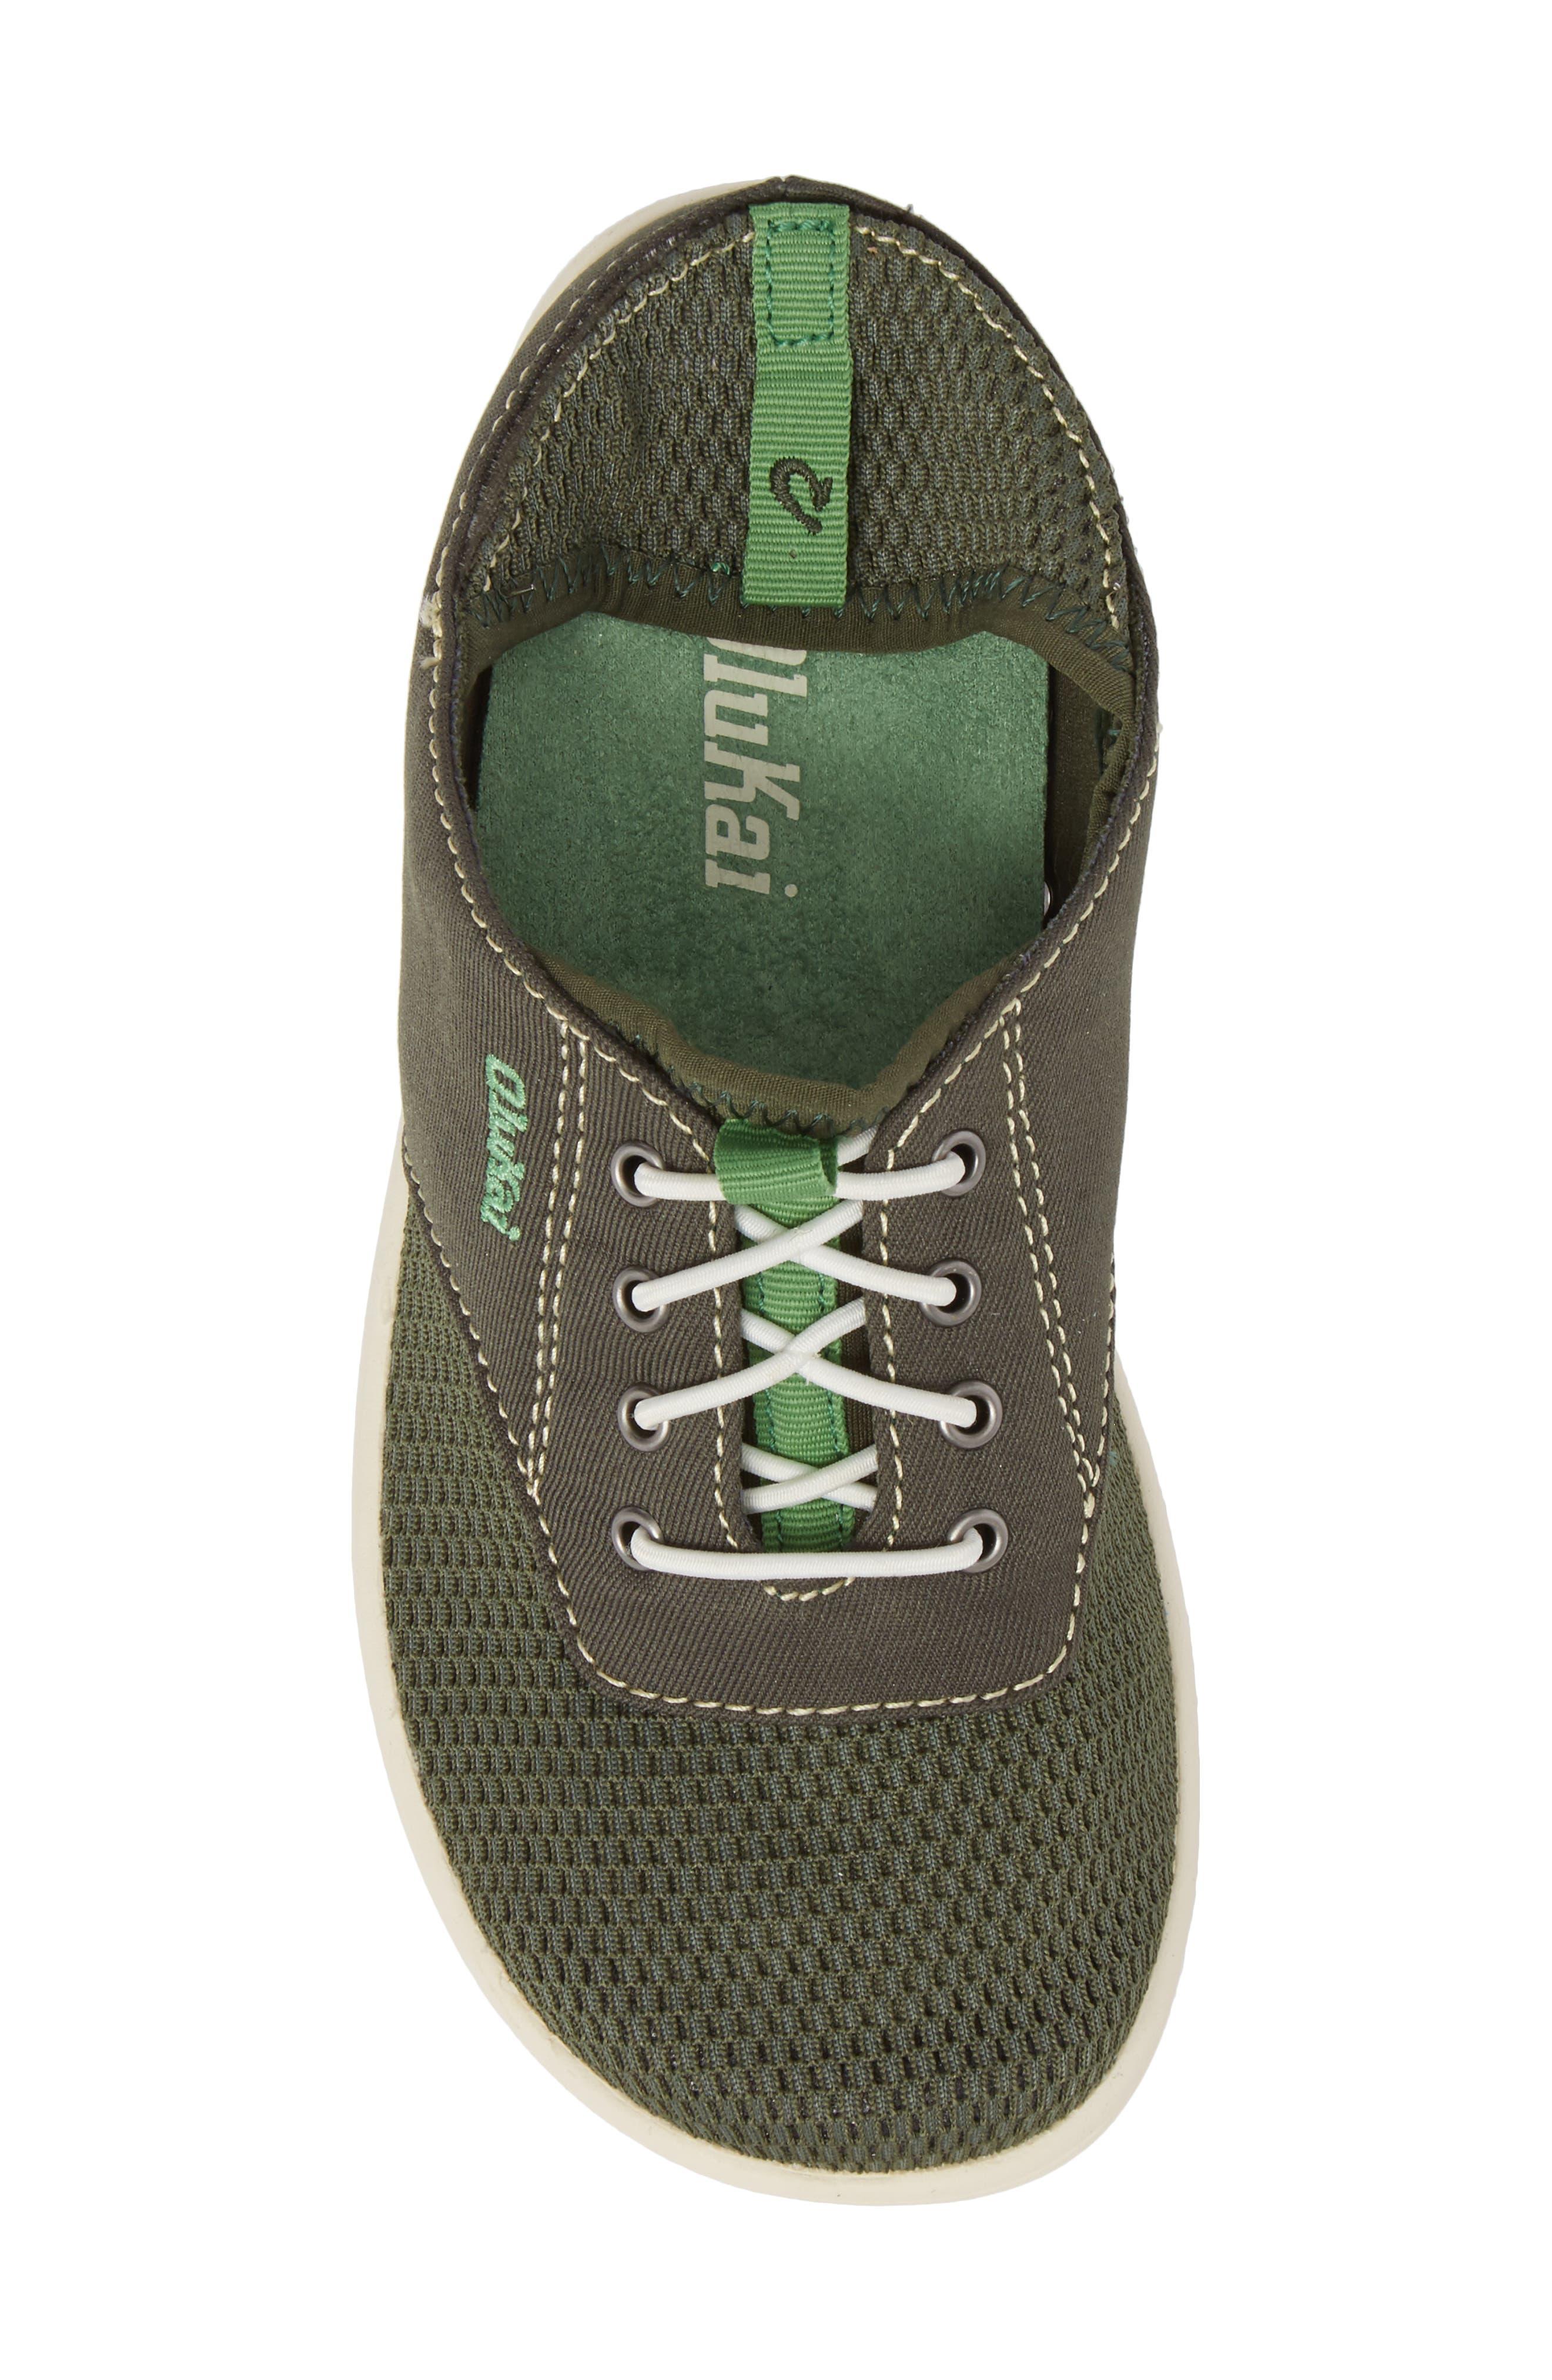 Nohea Moku Water Resistant Shoe,                             Alternate thumbnail 6, color,                             SEA GRASS/ SEA GRASS